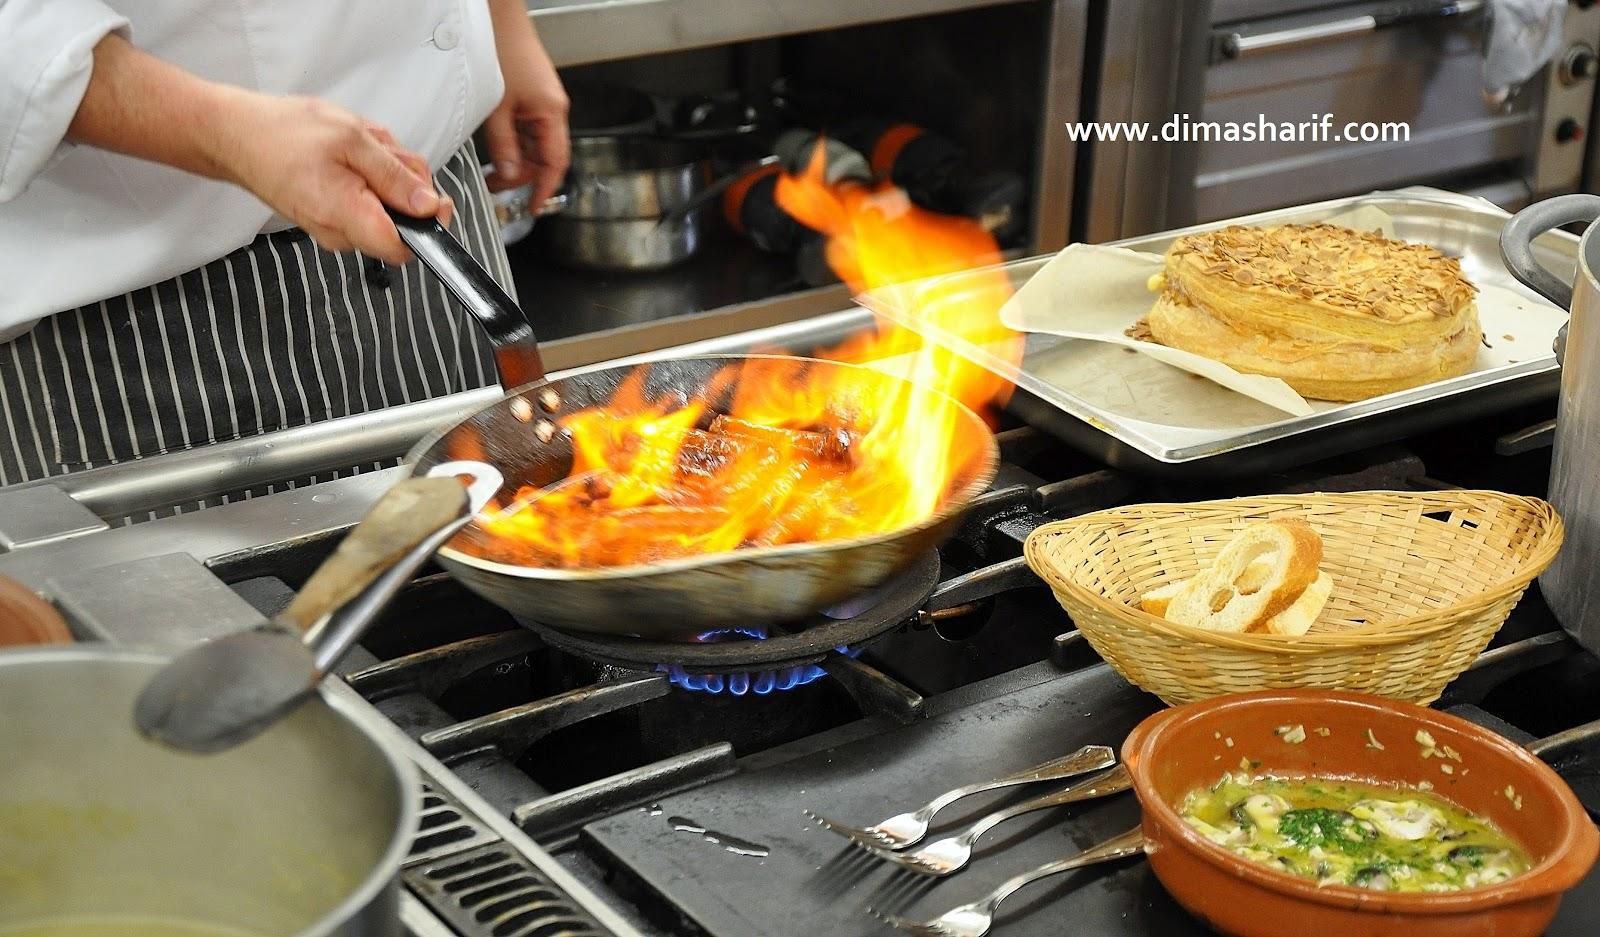 http://1.bp.blogspot.com/-545n-CiWSR8/T7iClT6BfEI/AAAAAAAAEAQ/bdQQ8kDM5cI/s1600/DSC_SanSebastian+Parte+Gastronomic+Society+kitchen+0984_DimaSharif.jpg